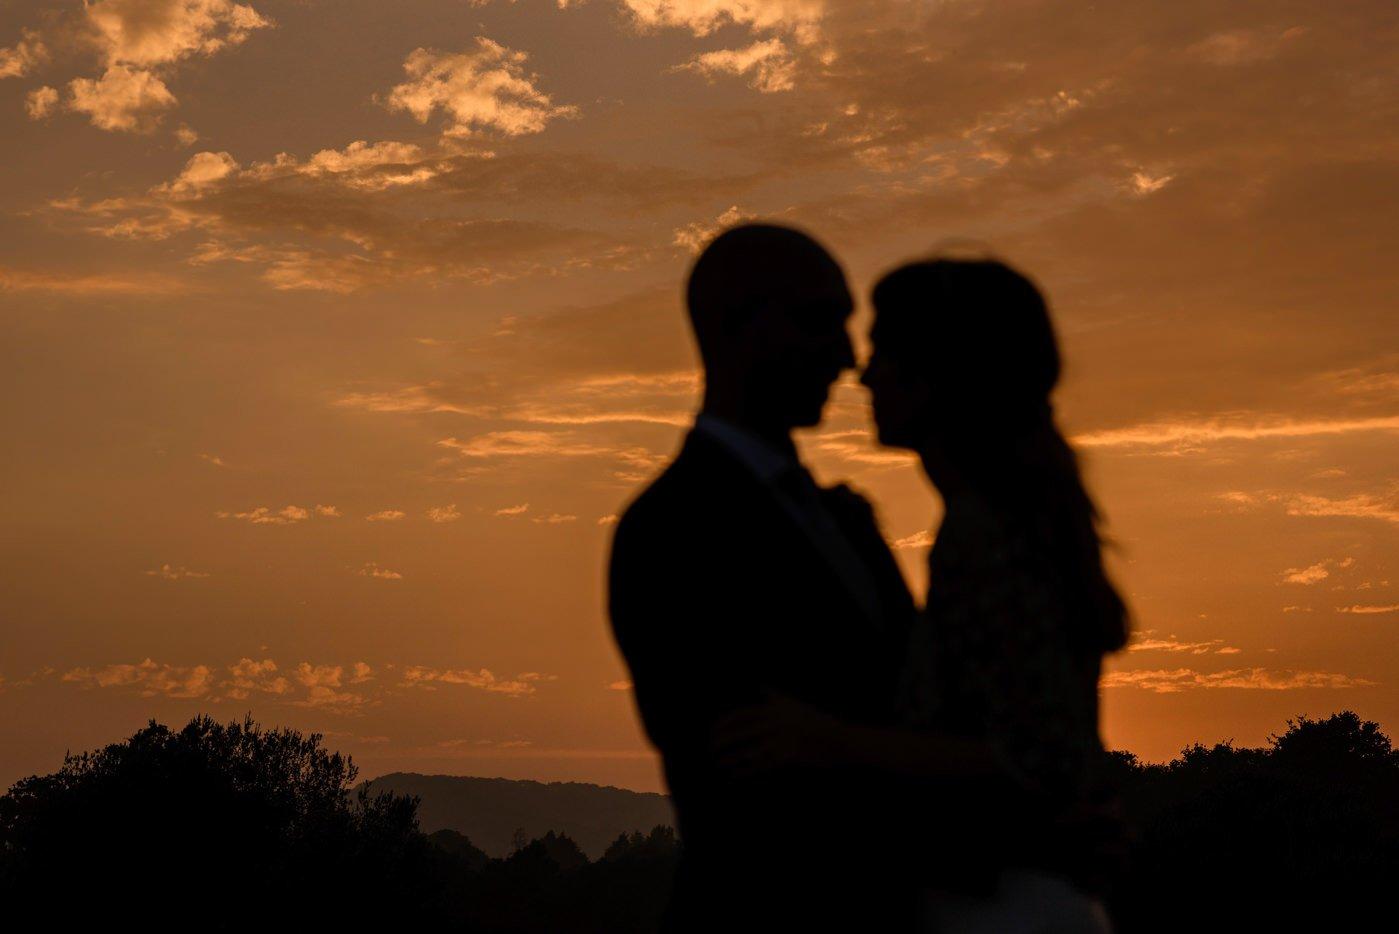 bignor-park-wedding-photography-robyn-and-tom-104